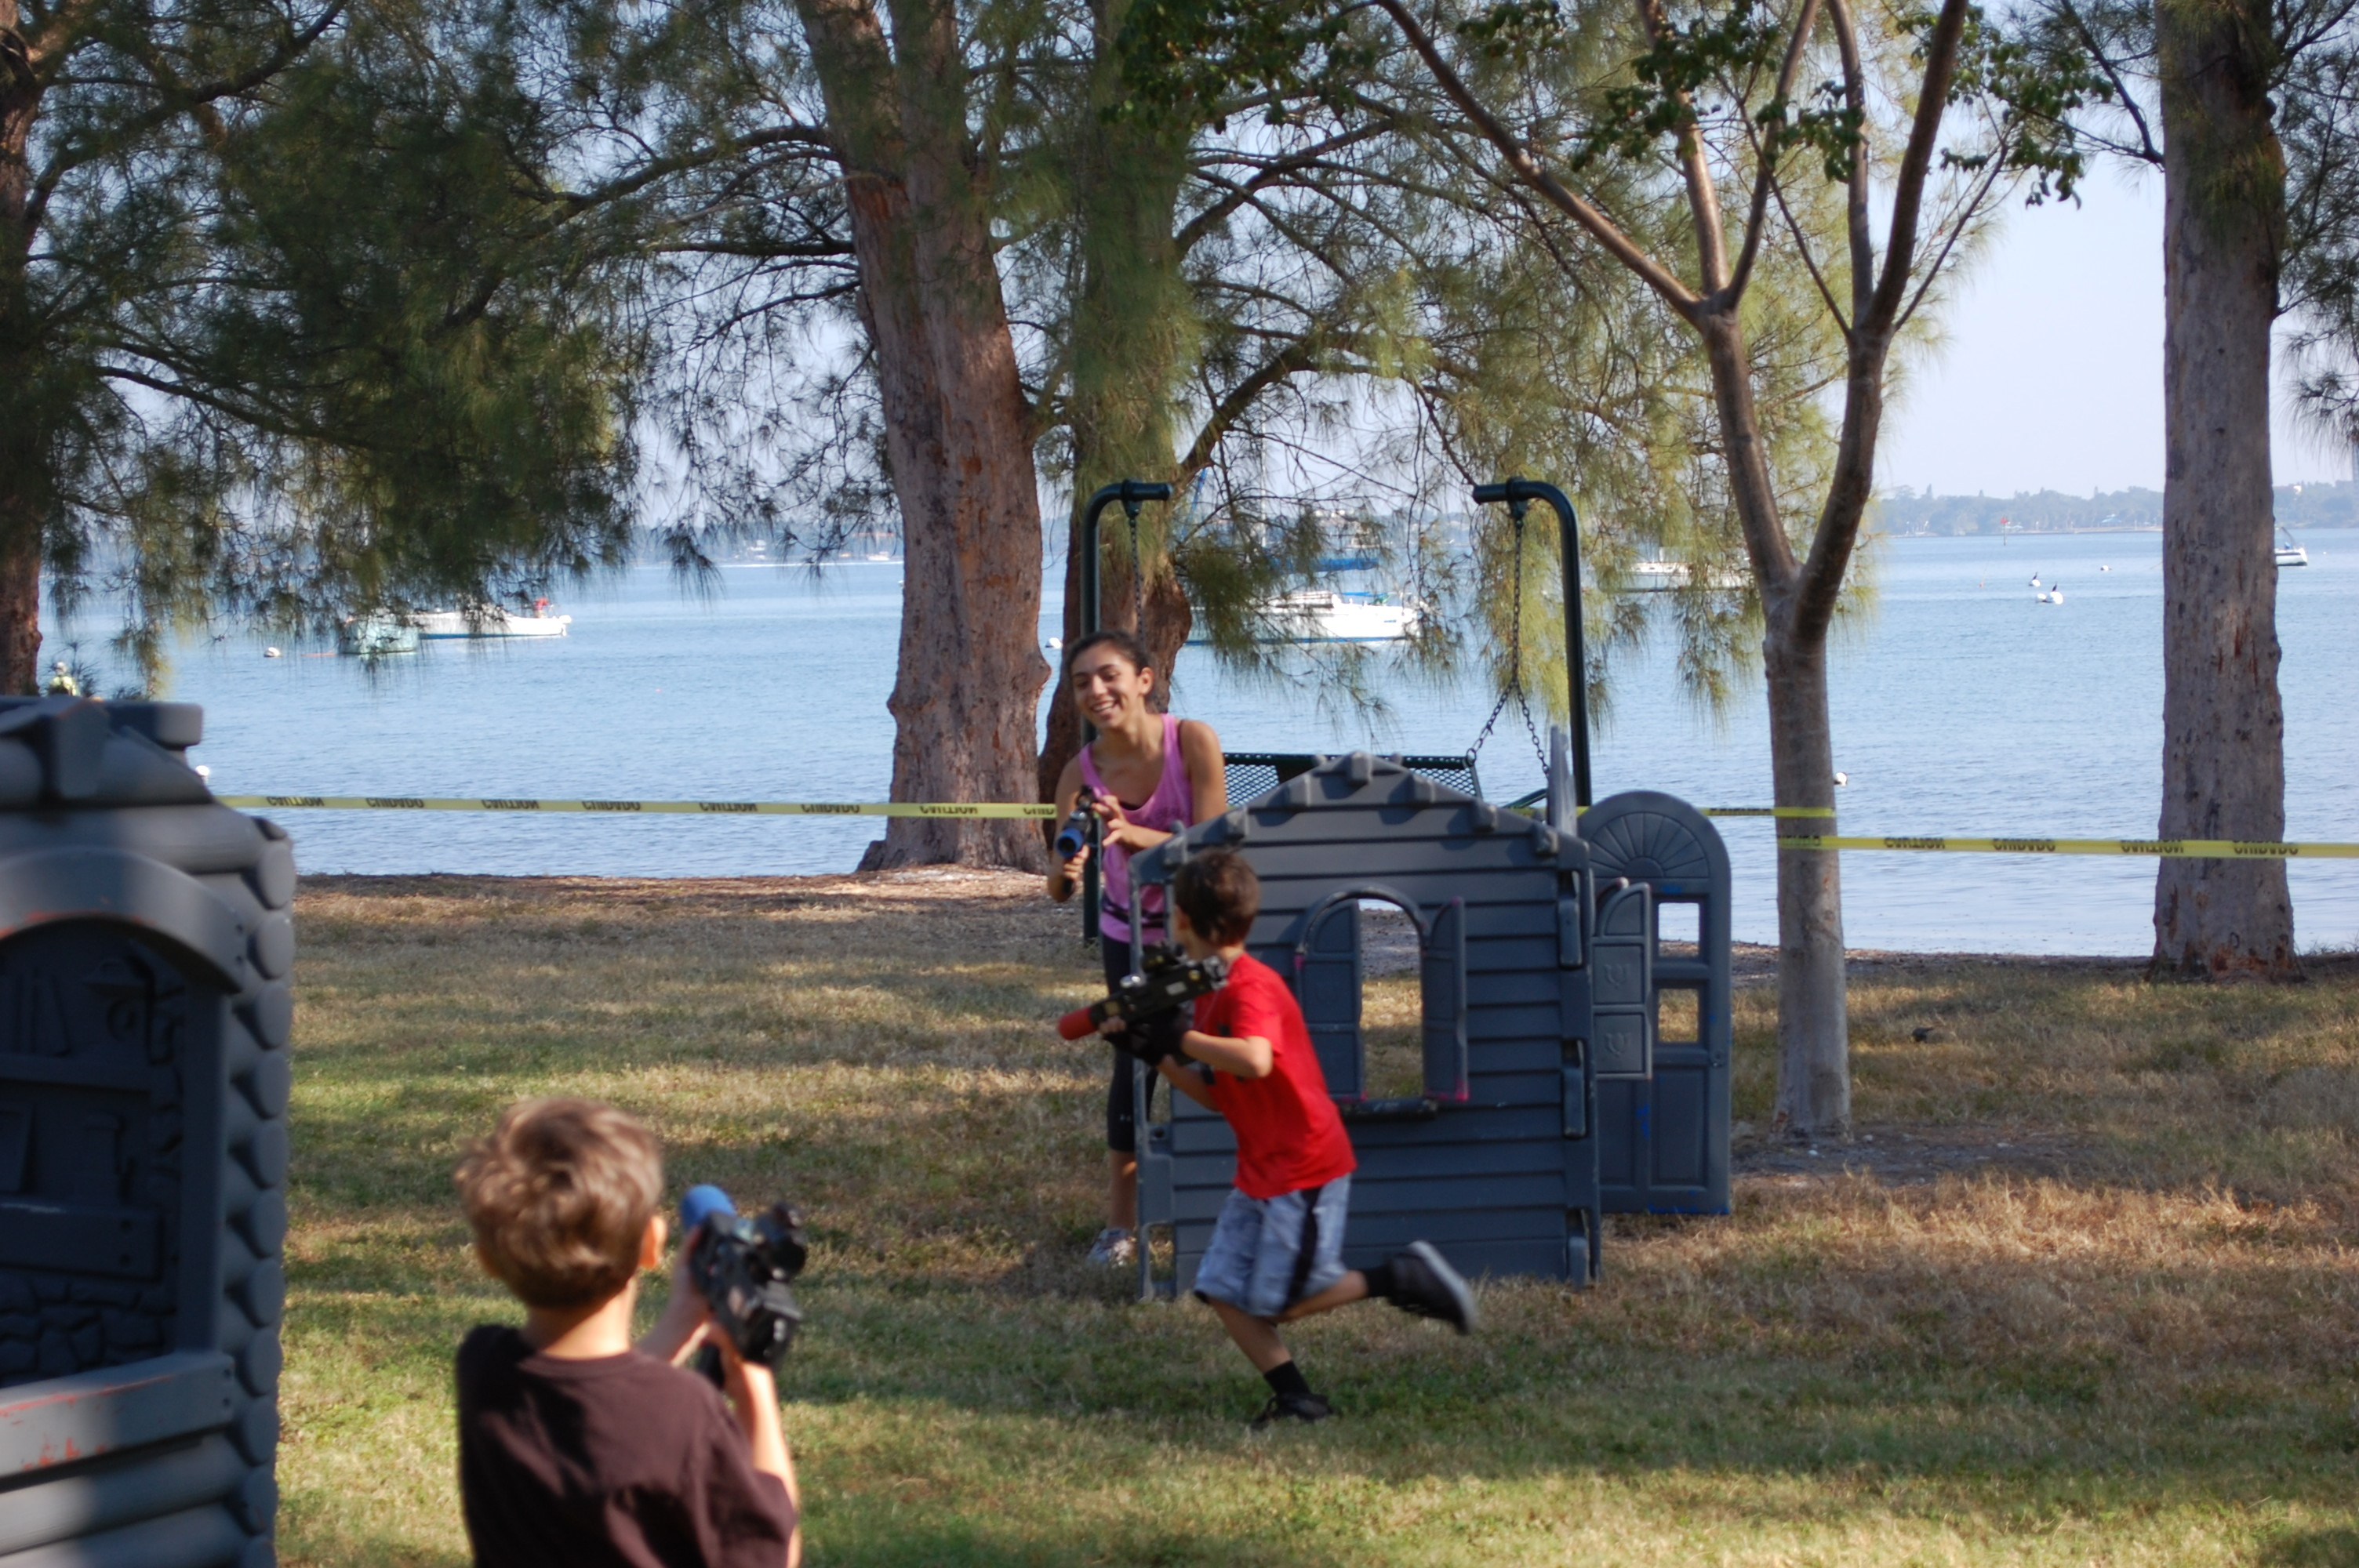 Mobile Laser Tag in Largo,FL